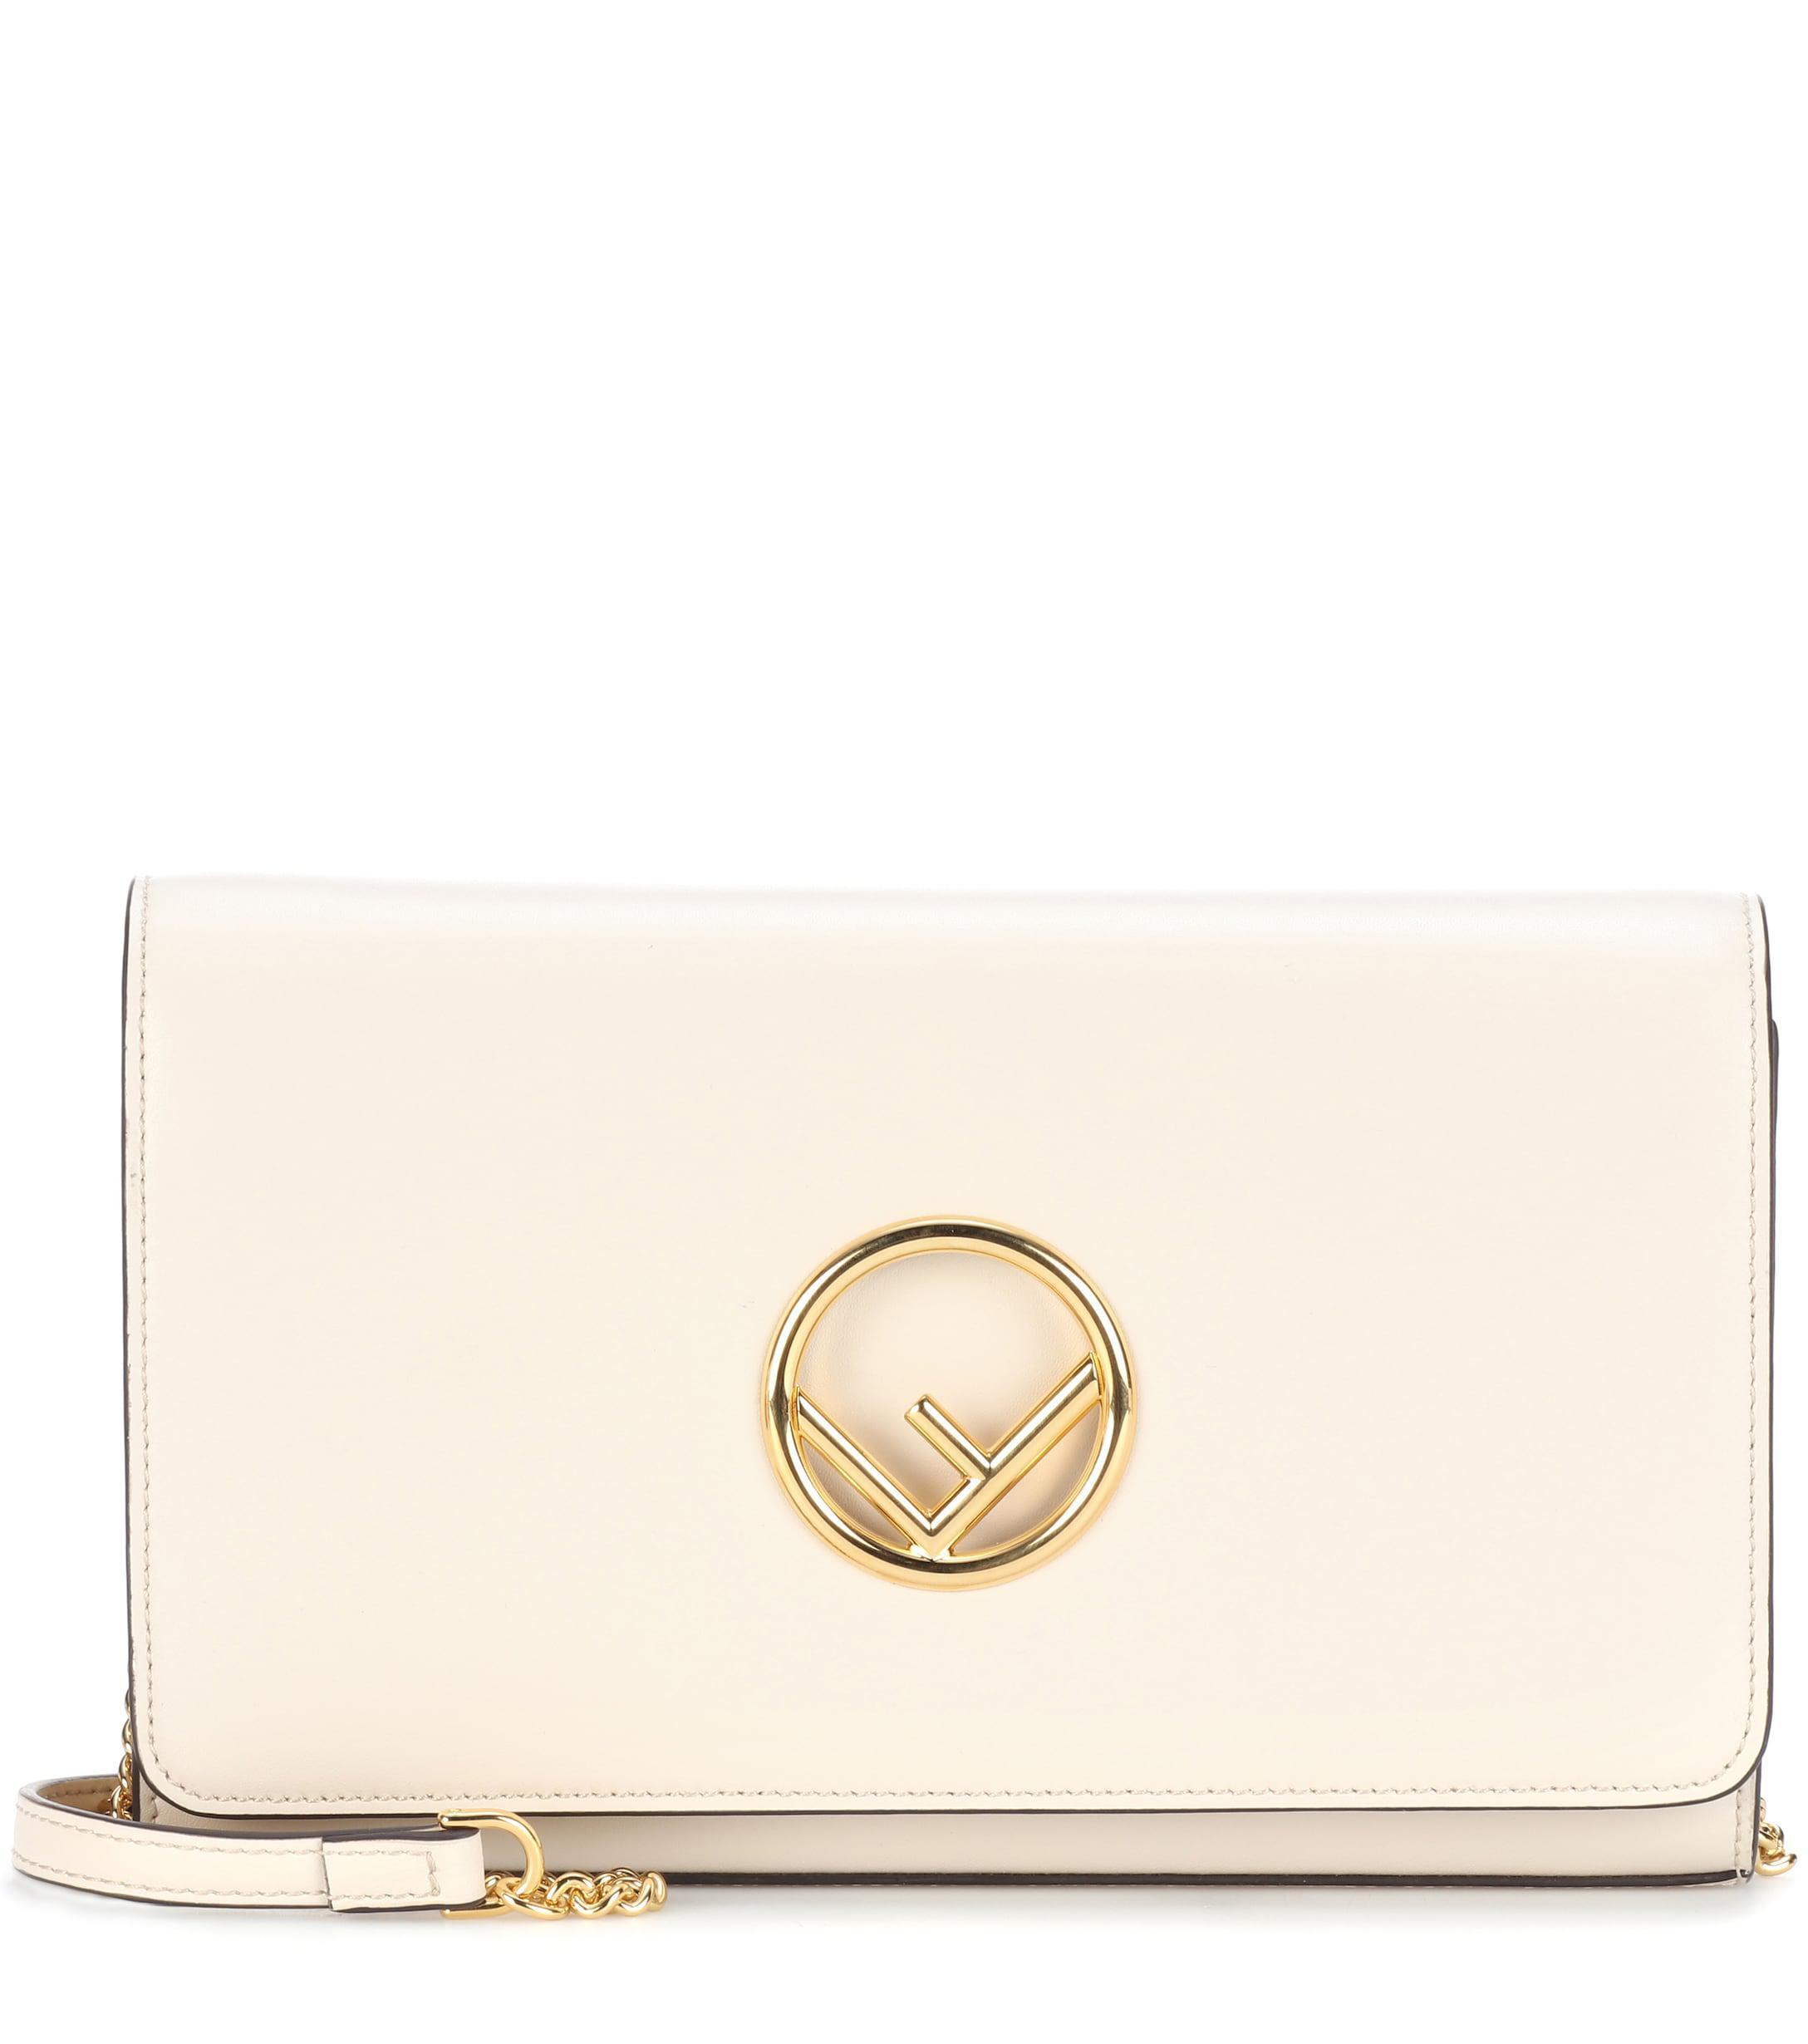 f8970a74e77 Fendi. Women s Wallet On Chain Leather Shoulder Bag